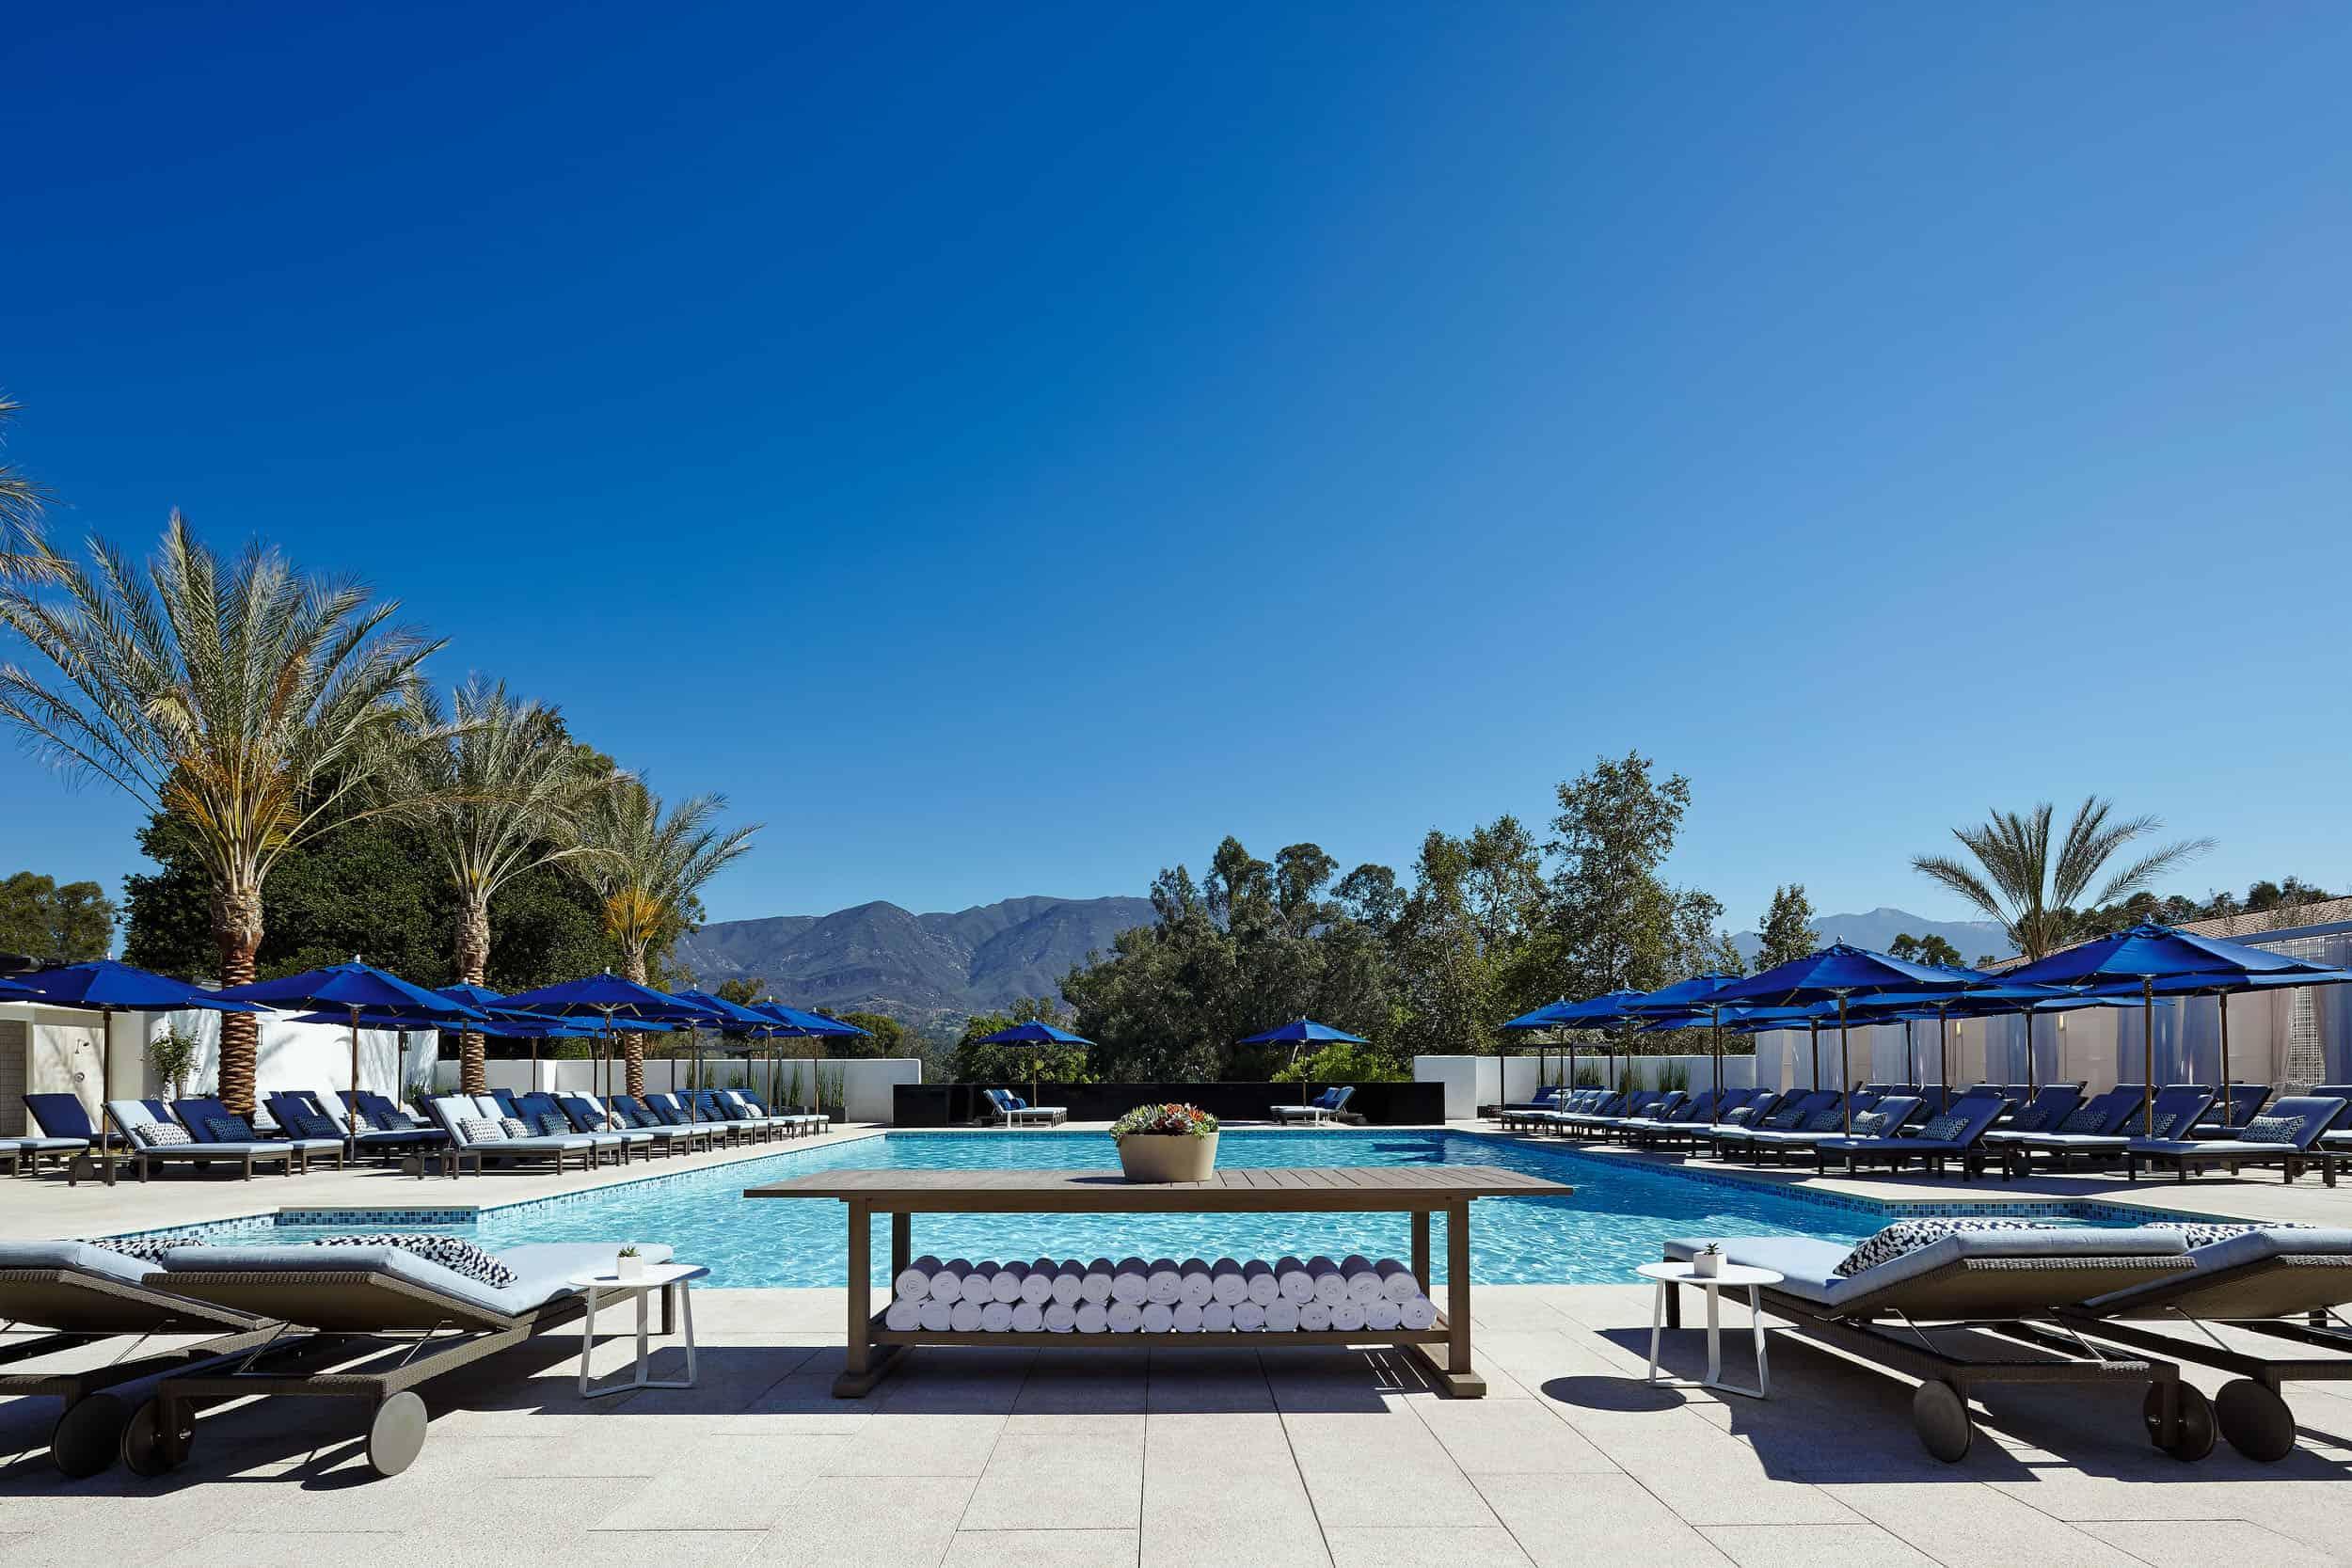 Ojai Valley Inn Outdoor Pool Cabana